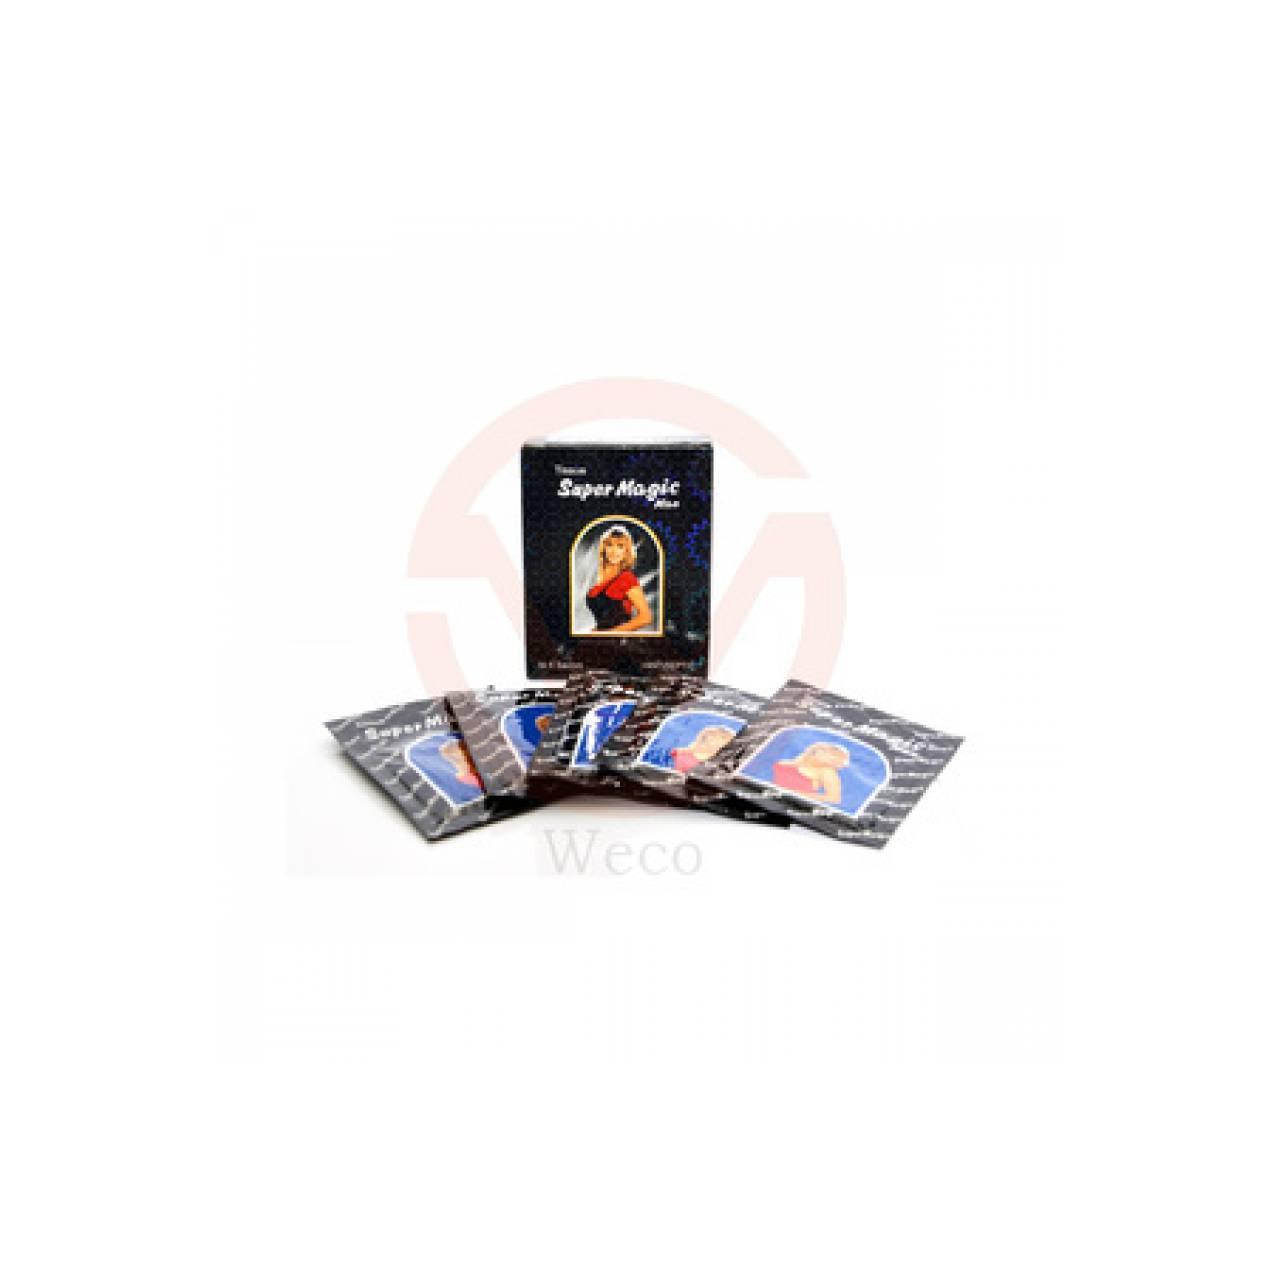 Jual Tissue Super Magic Murah Garansi Dan Berkualitas Id Store Tisu Man Aroma Casanova Power Depkesidr103268 Rp 4480000